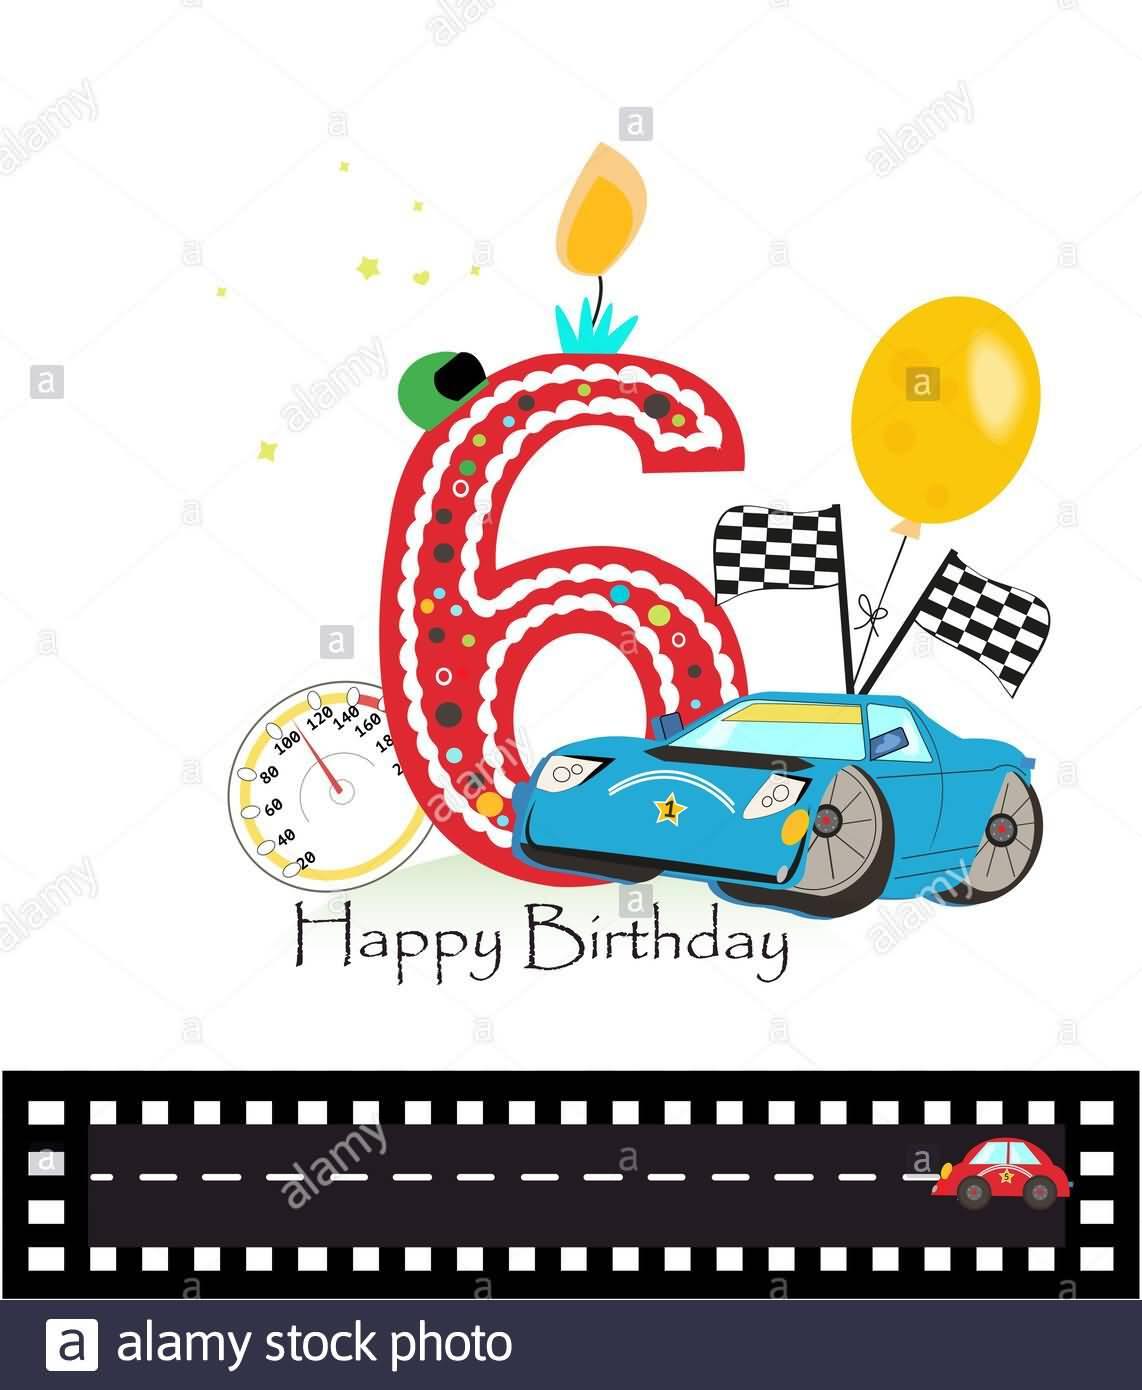 Wonderful 6th Birthday Greeting For Kid